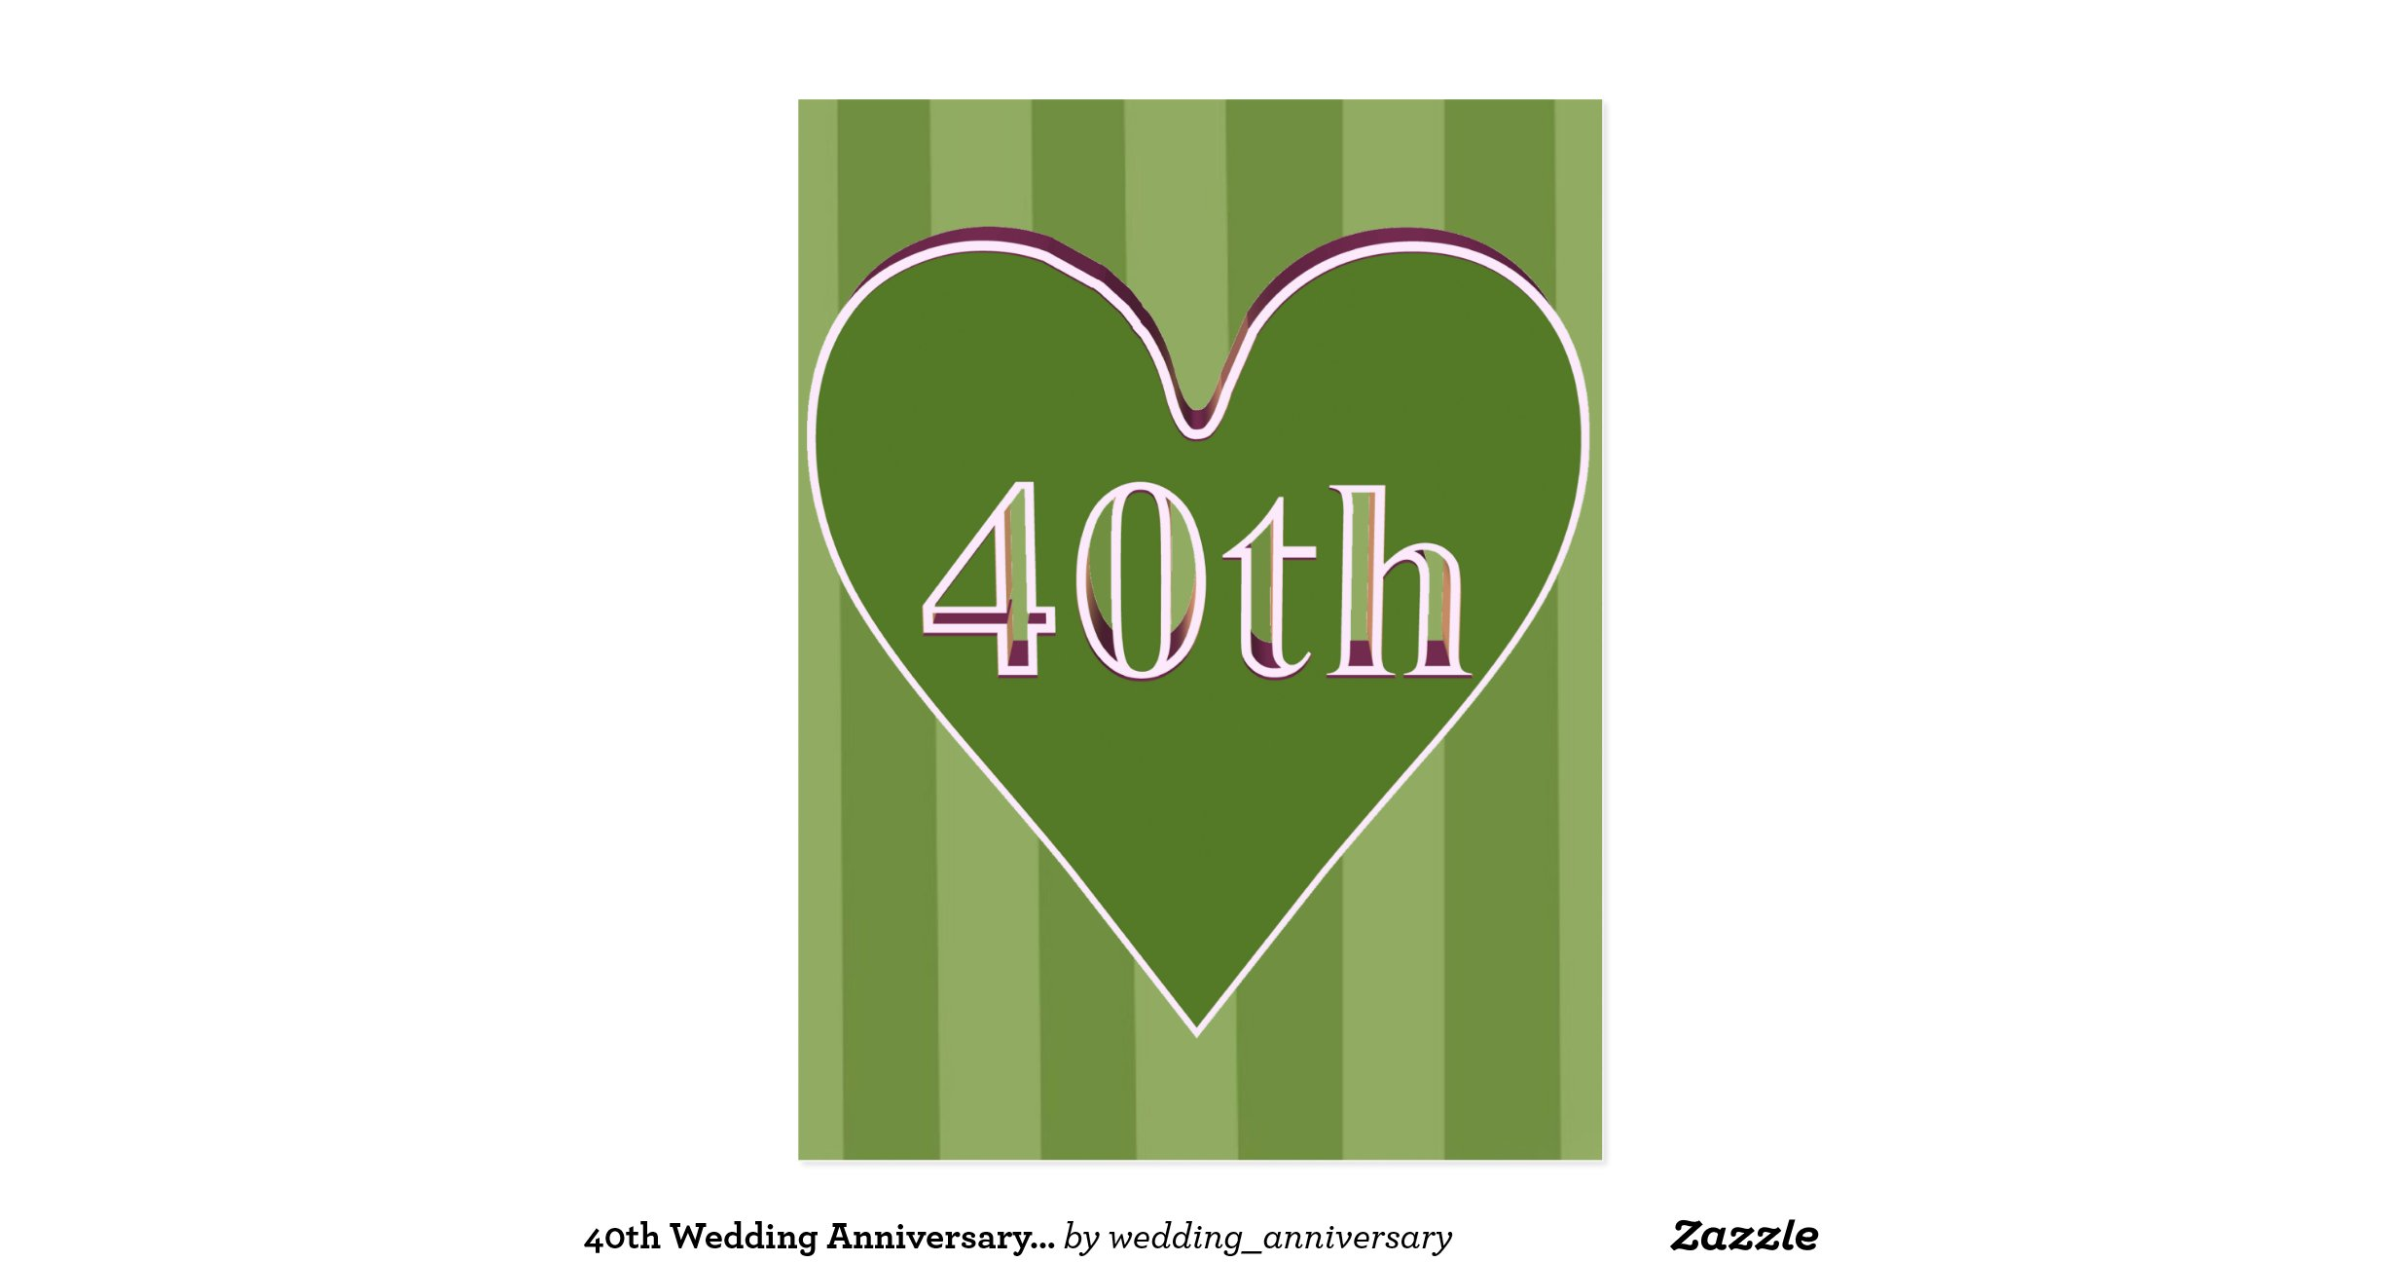 Gift Ideas 40th Wedding Anniversary: 40th_wedding_anniversary_gifts_postcard